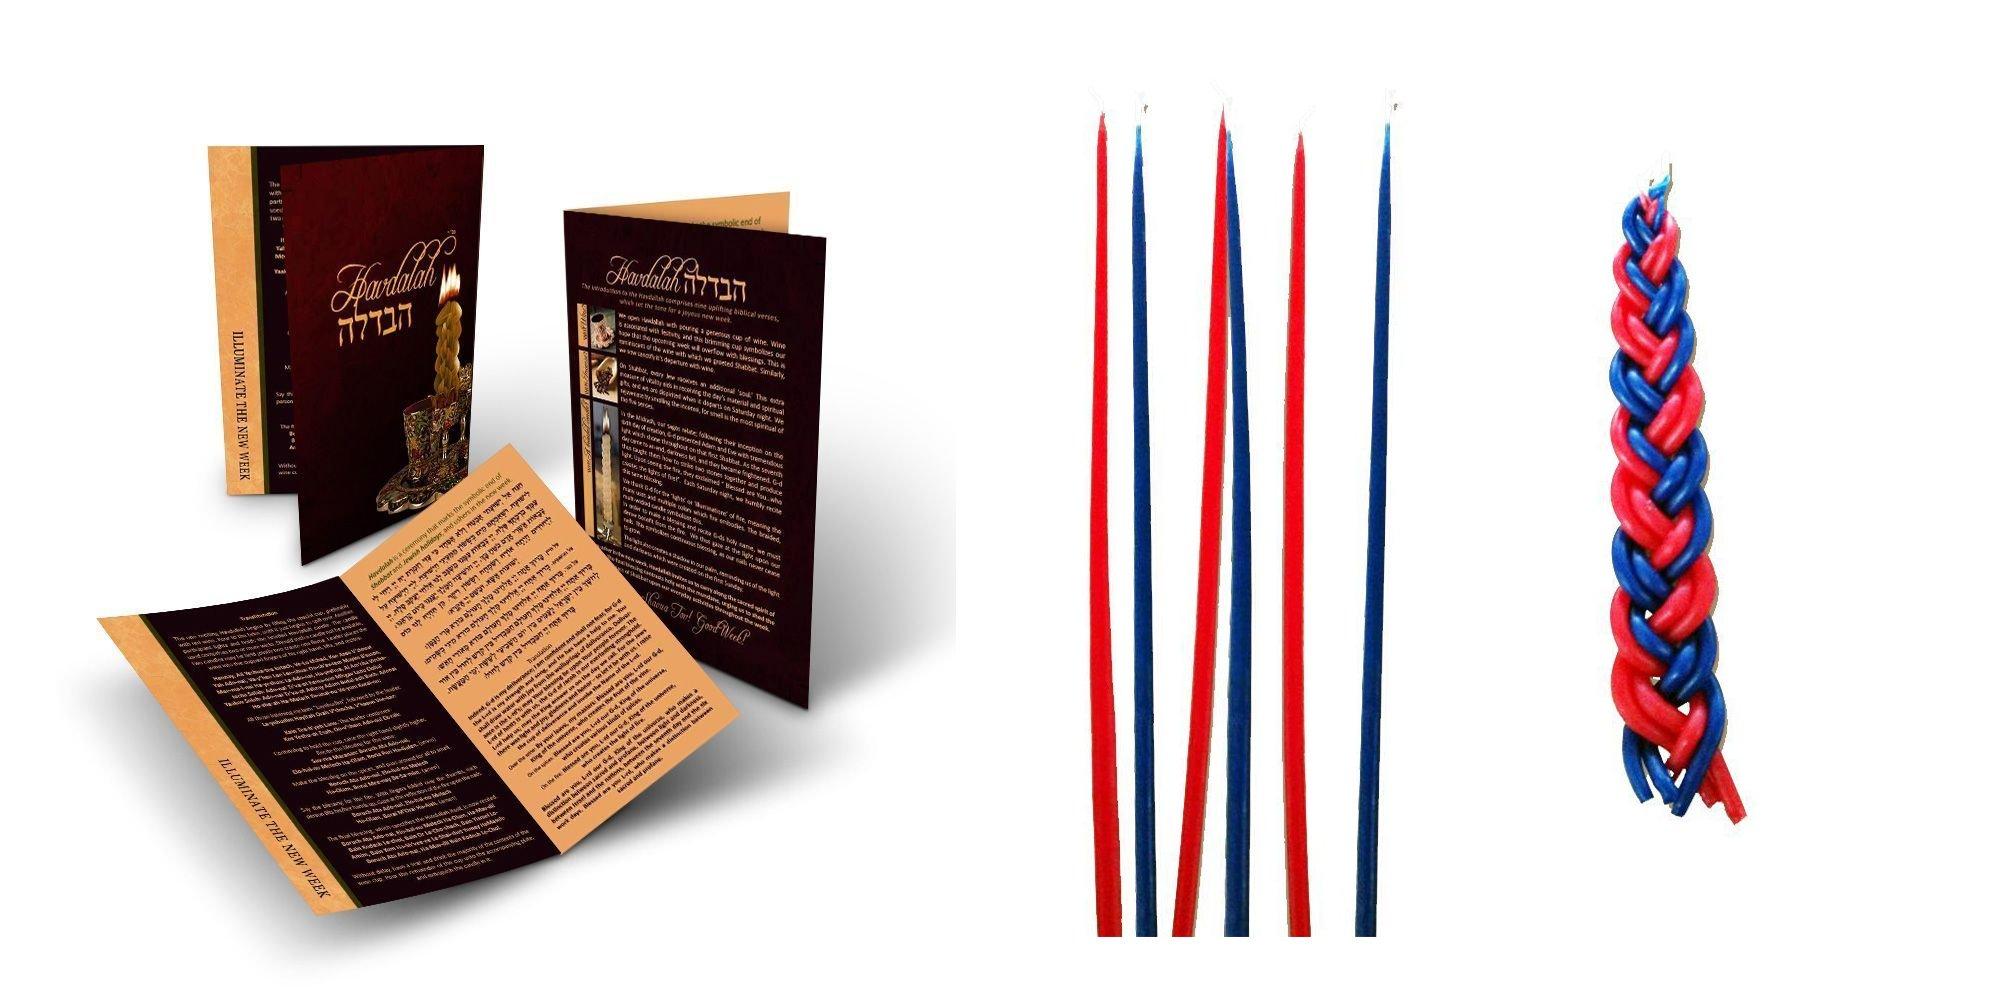 Havdalah Ceremony Prayer Services Bundle - Instruction Guide & Havdalah Candle For Kids - Create Your Own Braided Havdalah Candles - Laminated Hard Card for Bar & Bat Mitzvah Gifts (10)